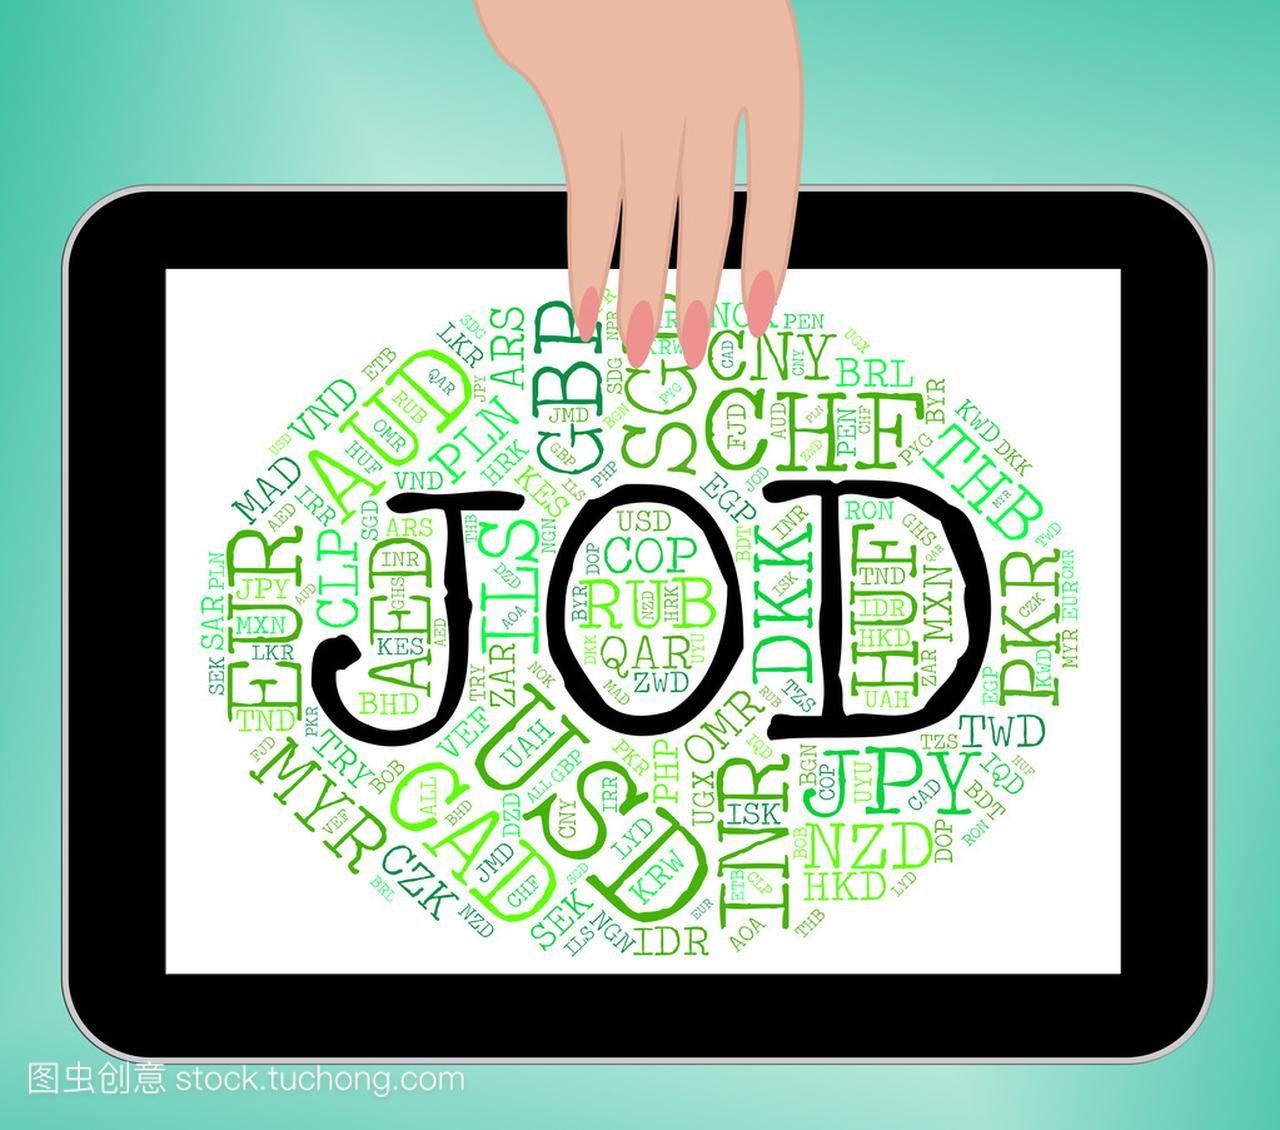 Jod 货币表示约旦第纳尔和外国